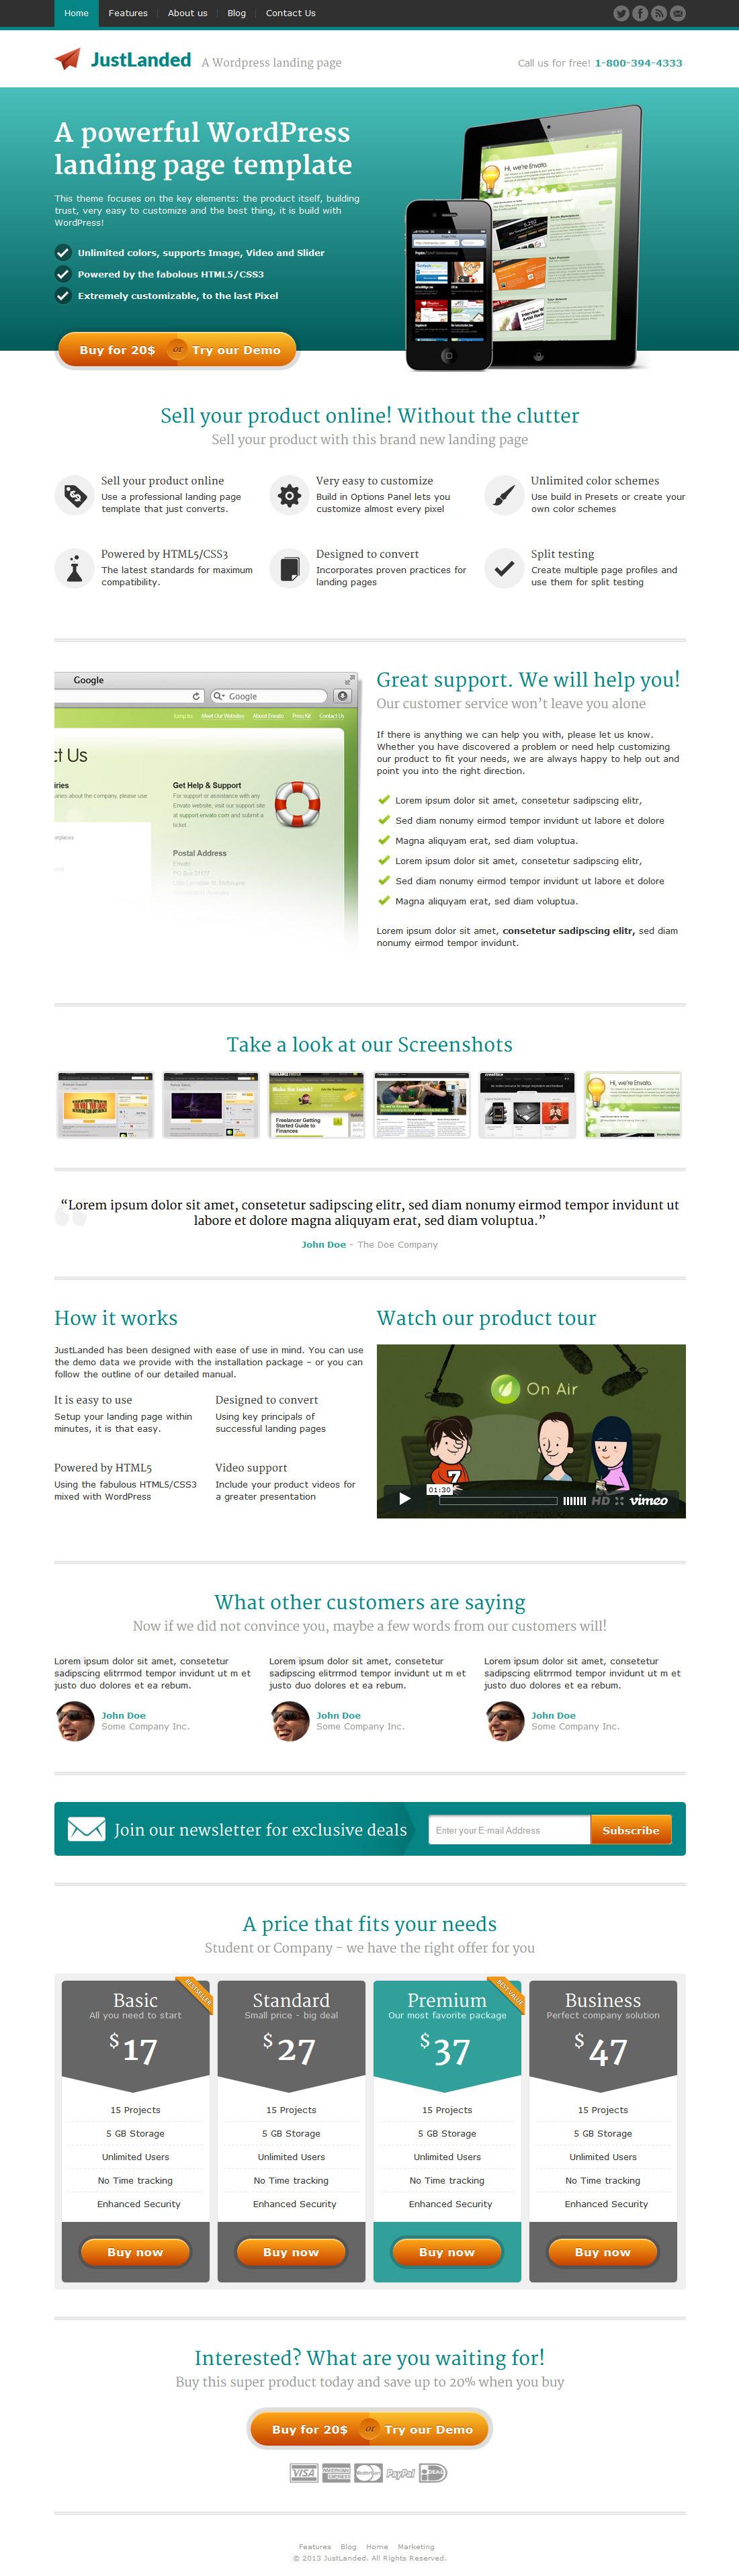 Justlanded Wordpress Landing Page By Shapingrain Themeforest